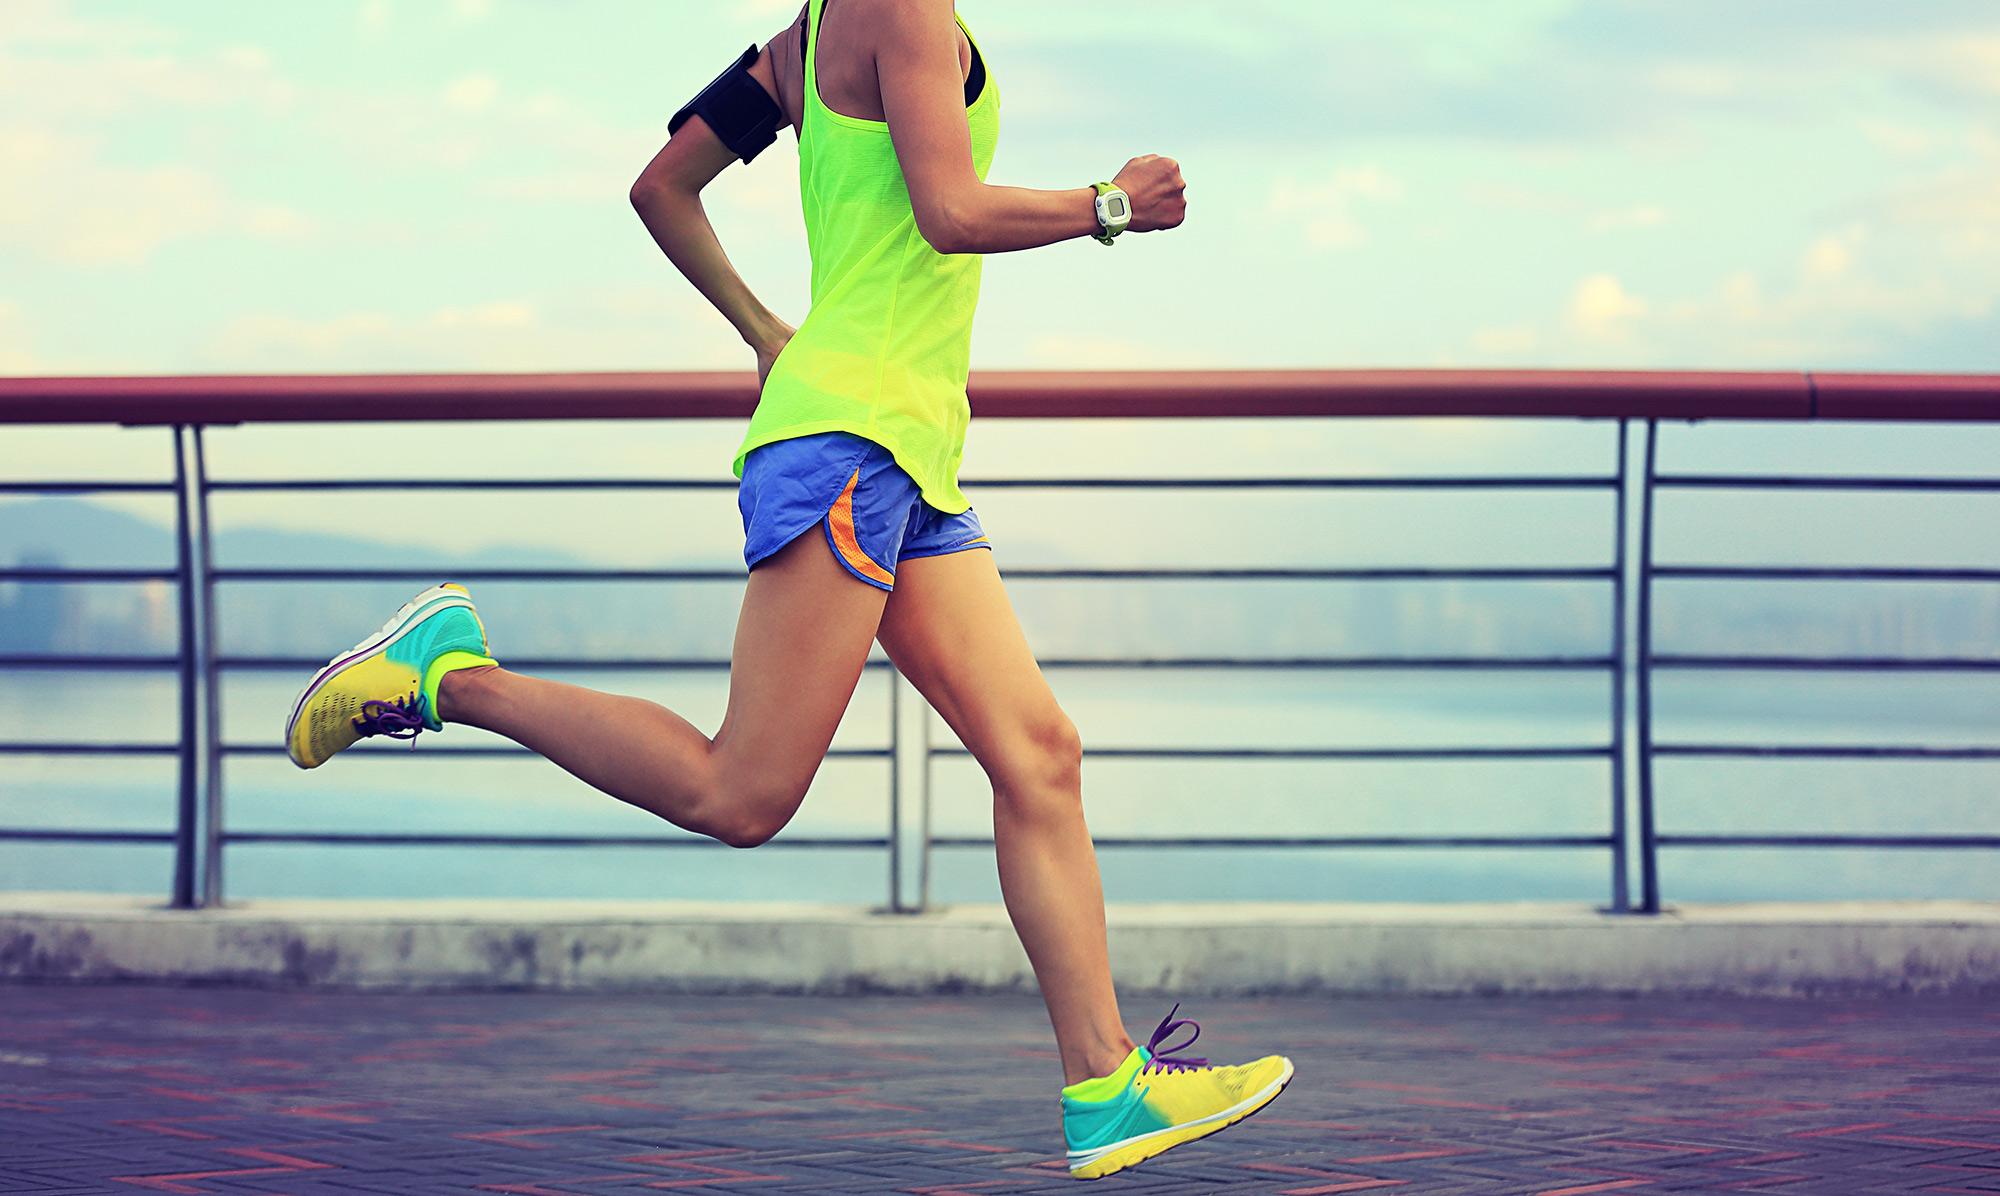 The-Urban-Physio-Running.jpg